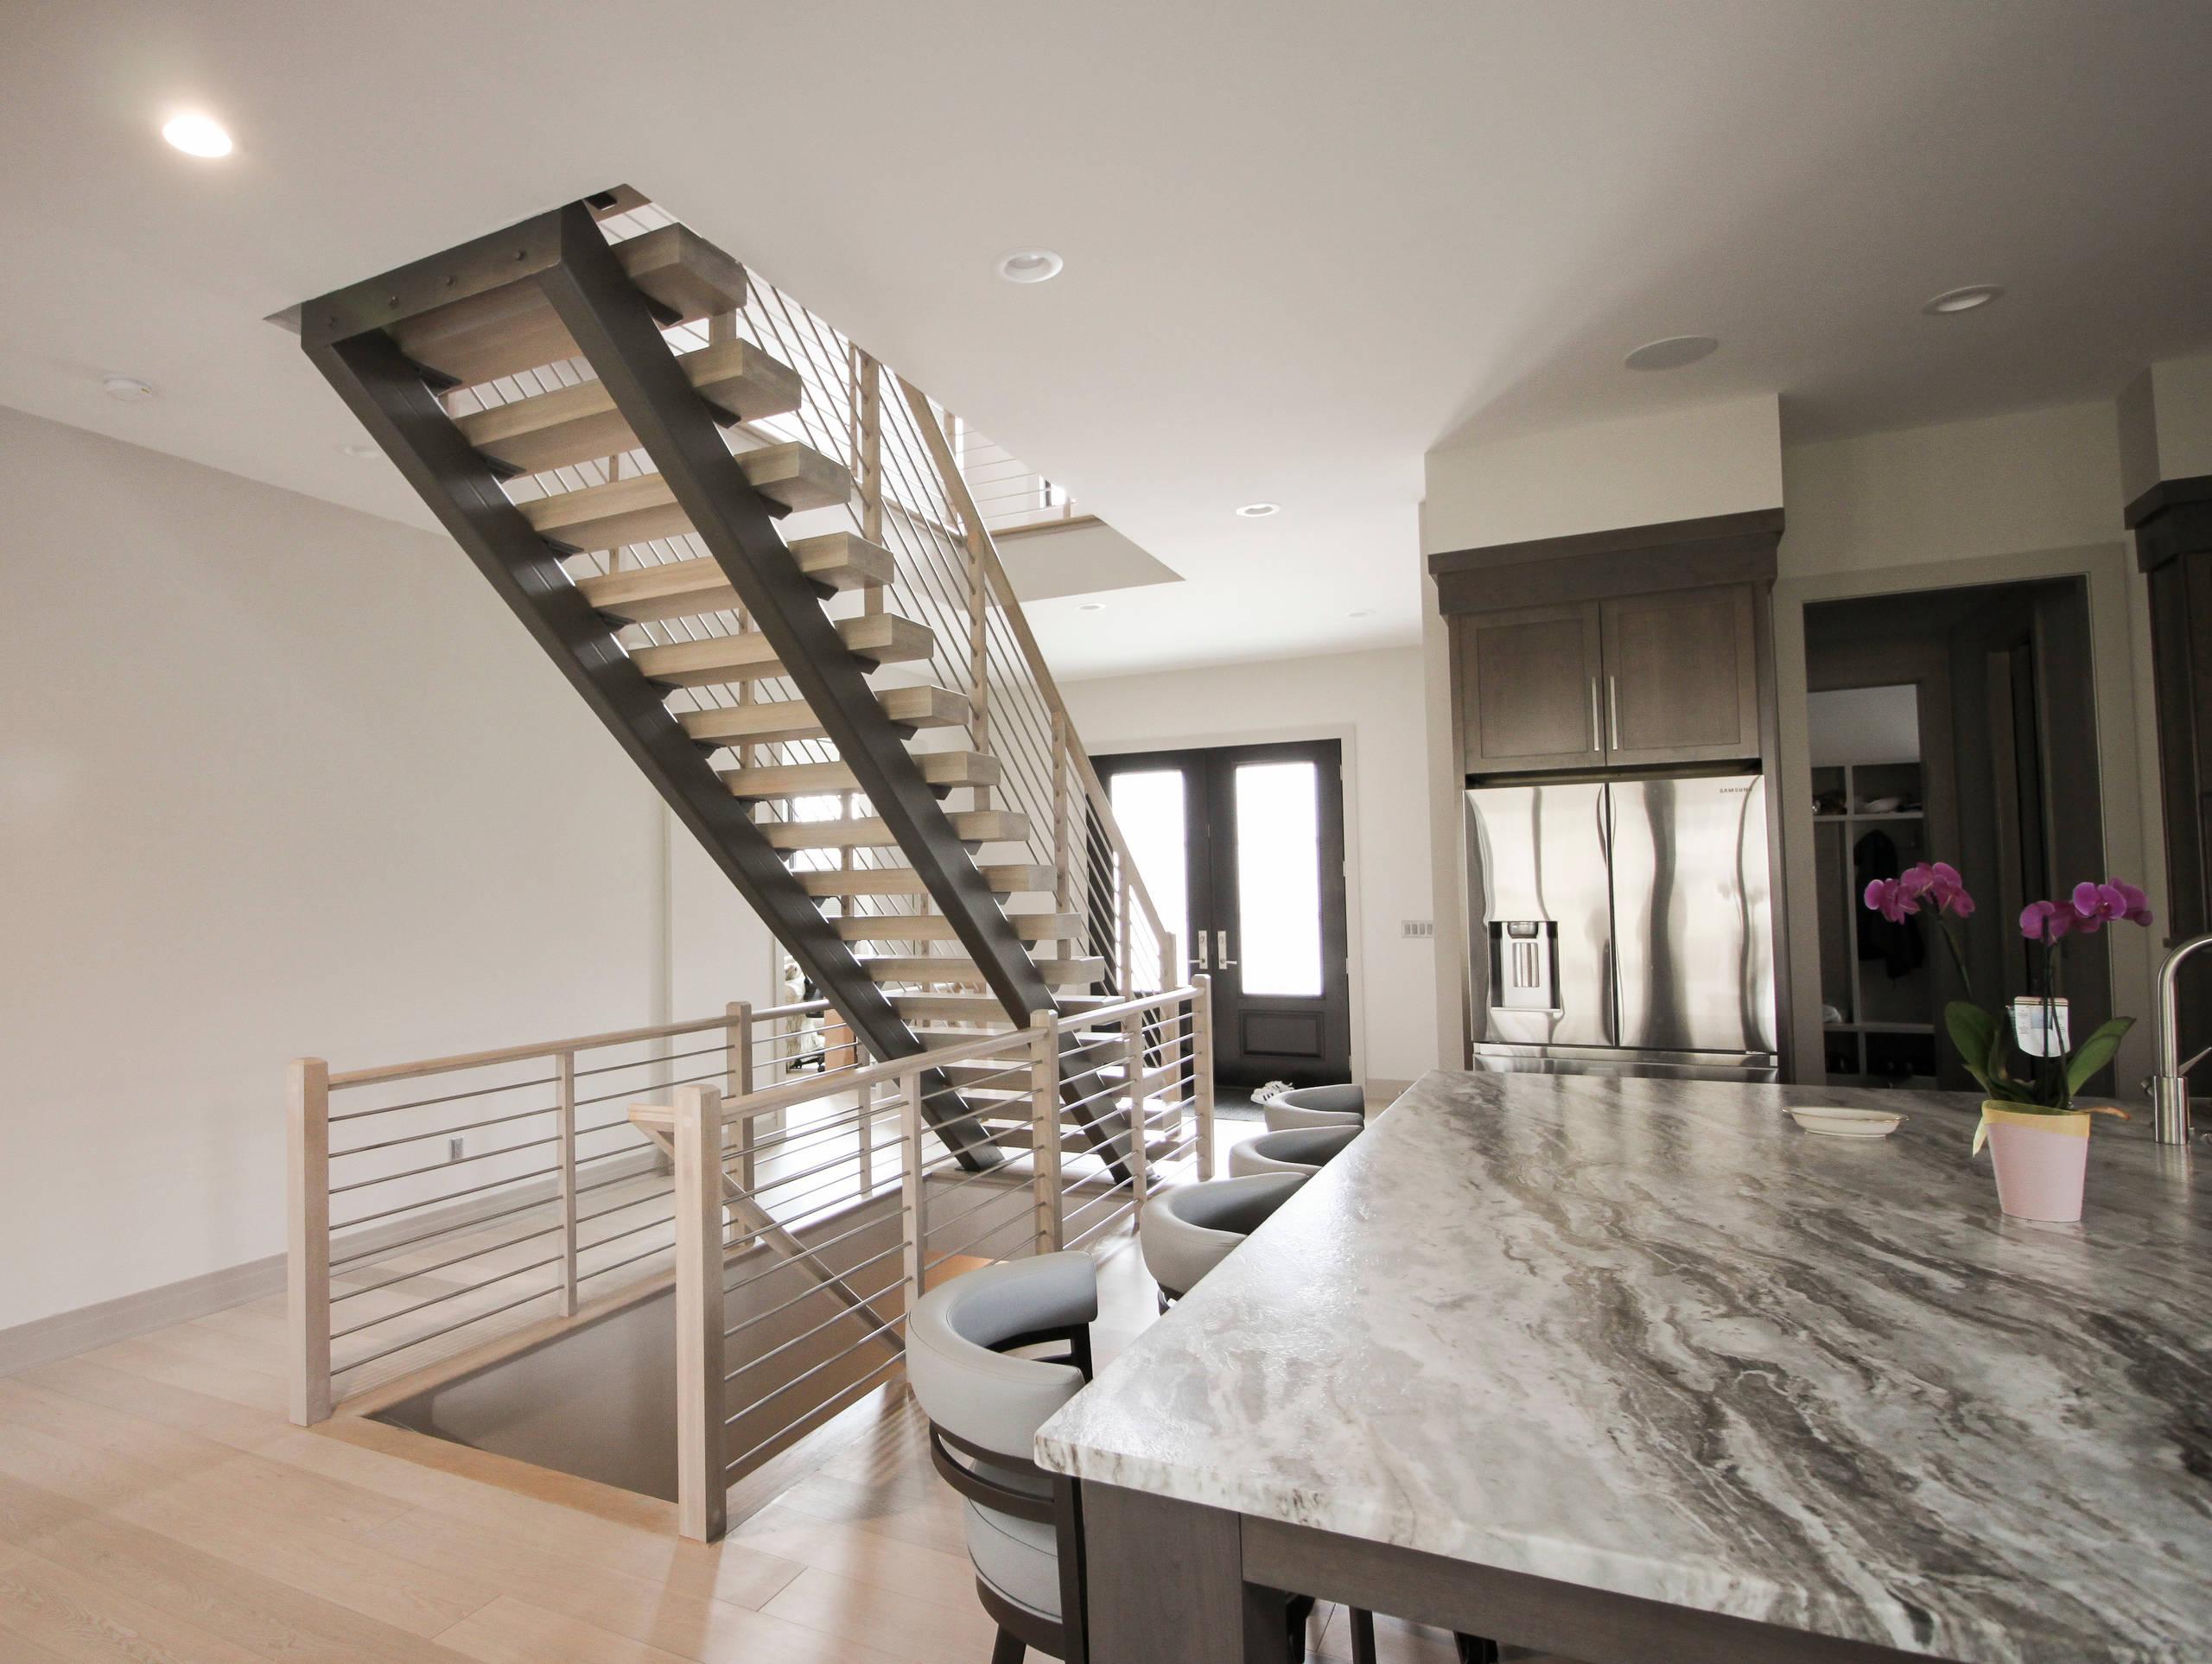 66_Eye-catching and Stylish Modern Staircase, Vienna VA 22180